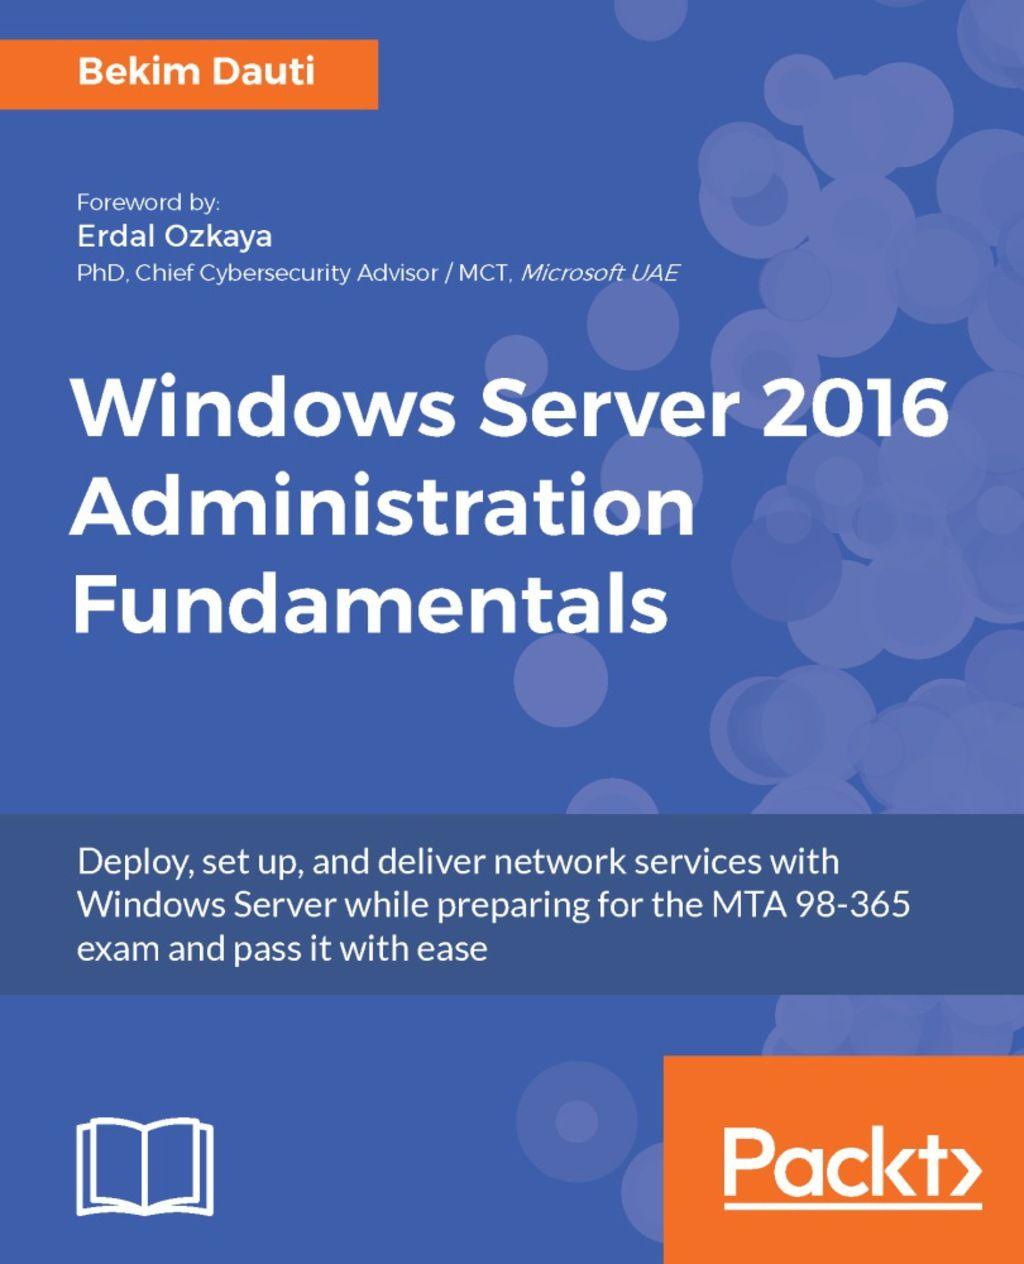 Windows Server 2016 Administration Fundamentals (eBook) in 2019